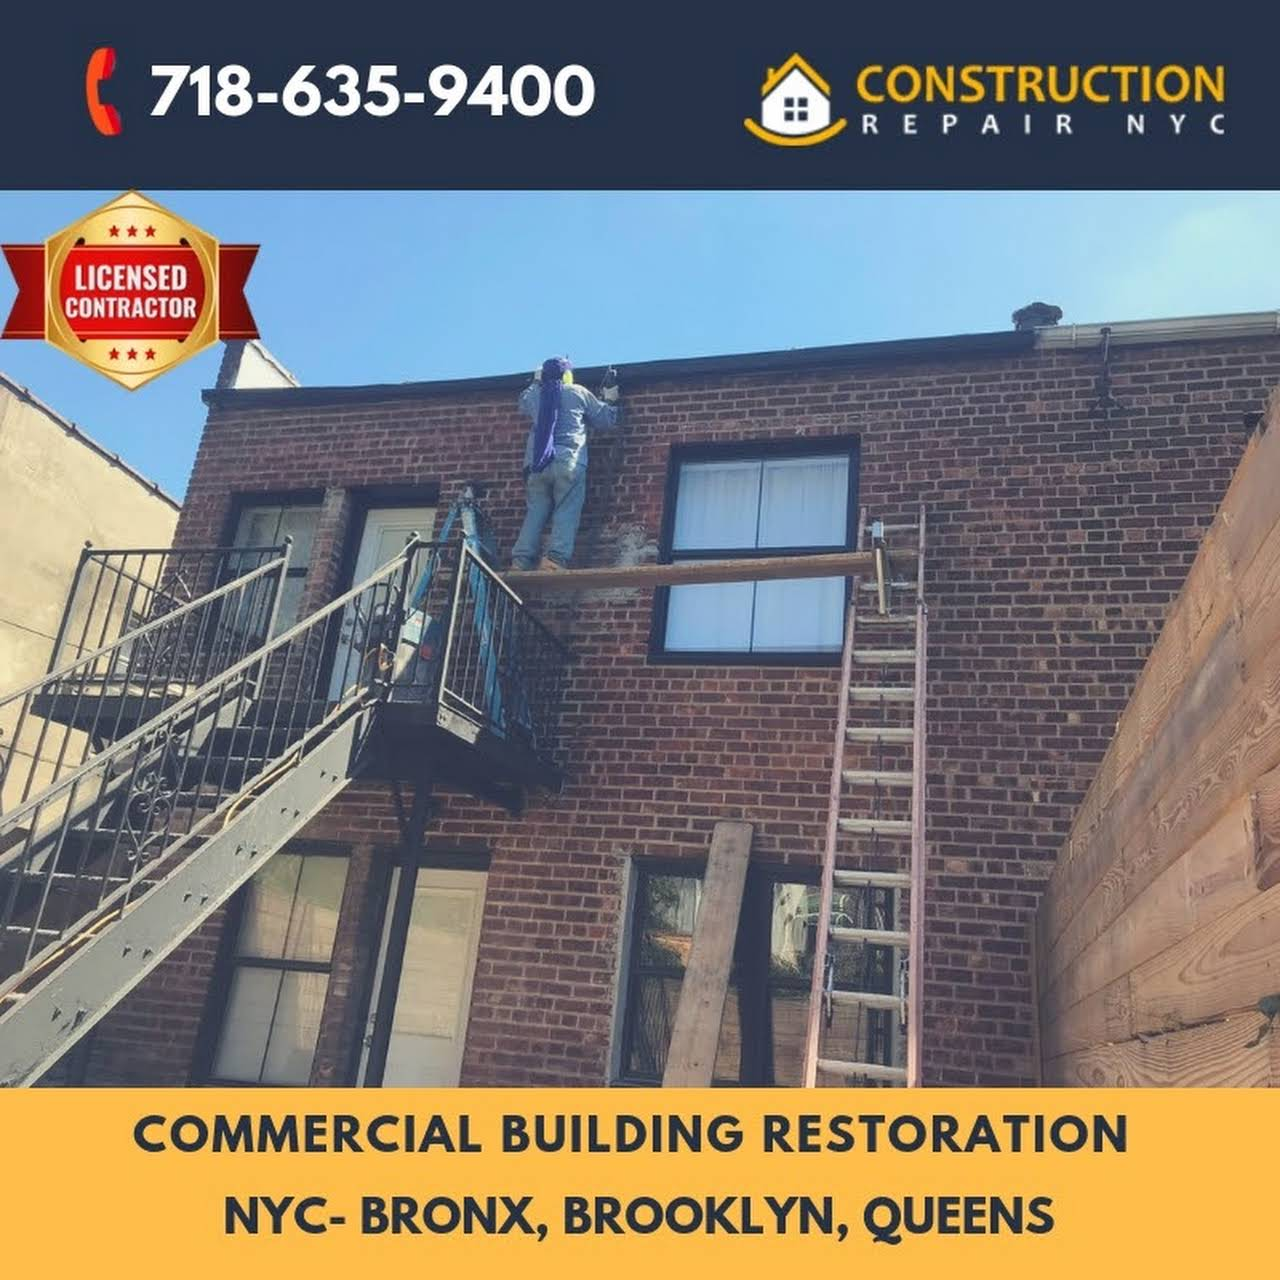 Construction Repair NYC - Masonry & Waterproofing